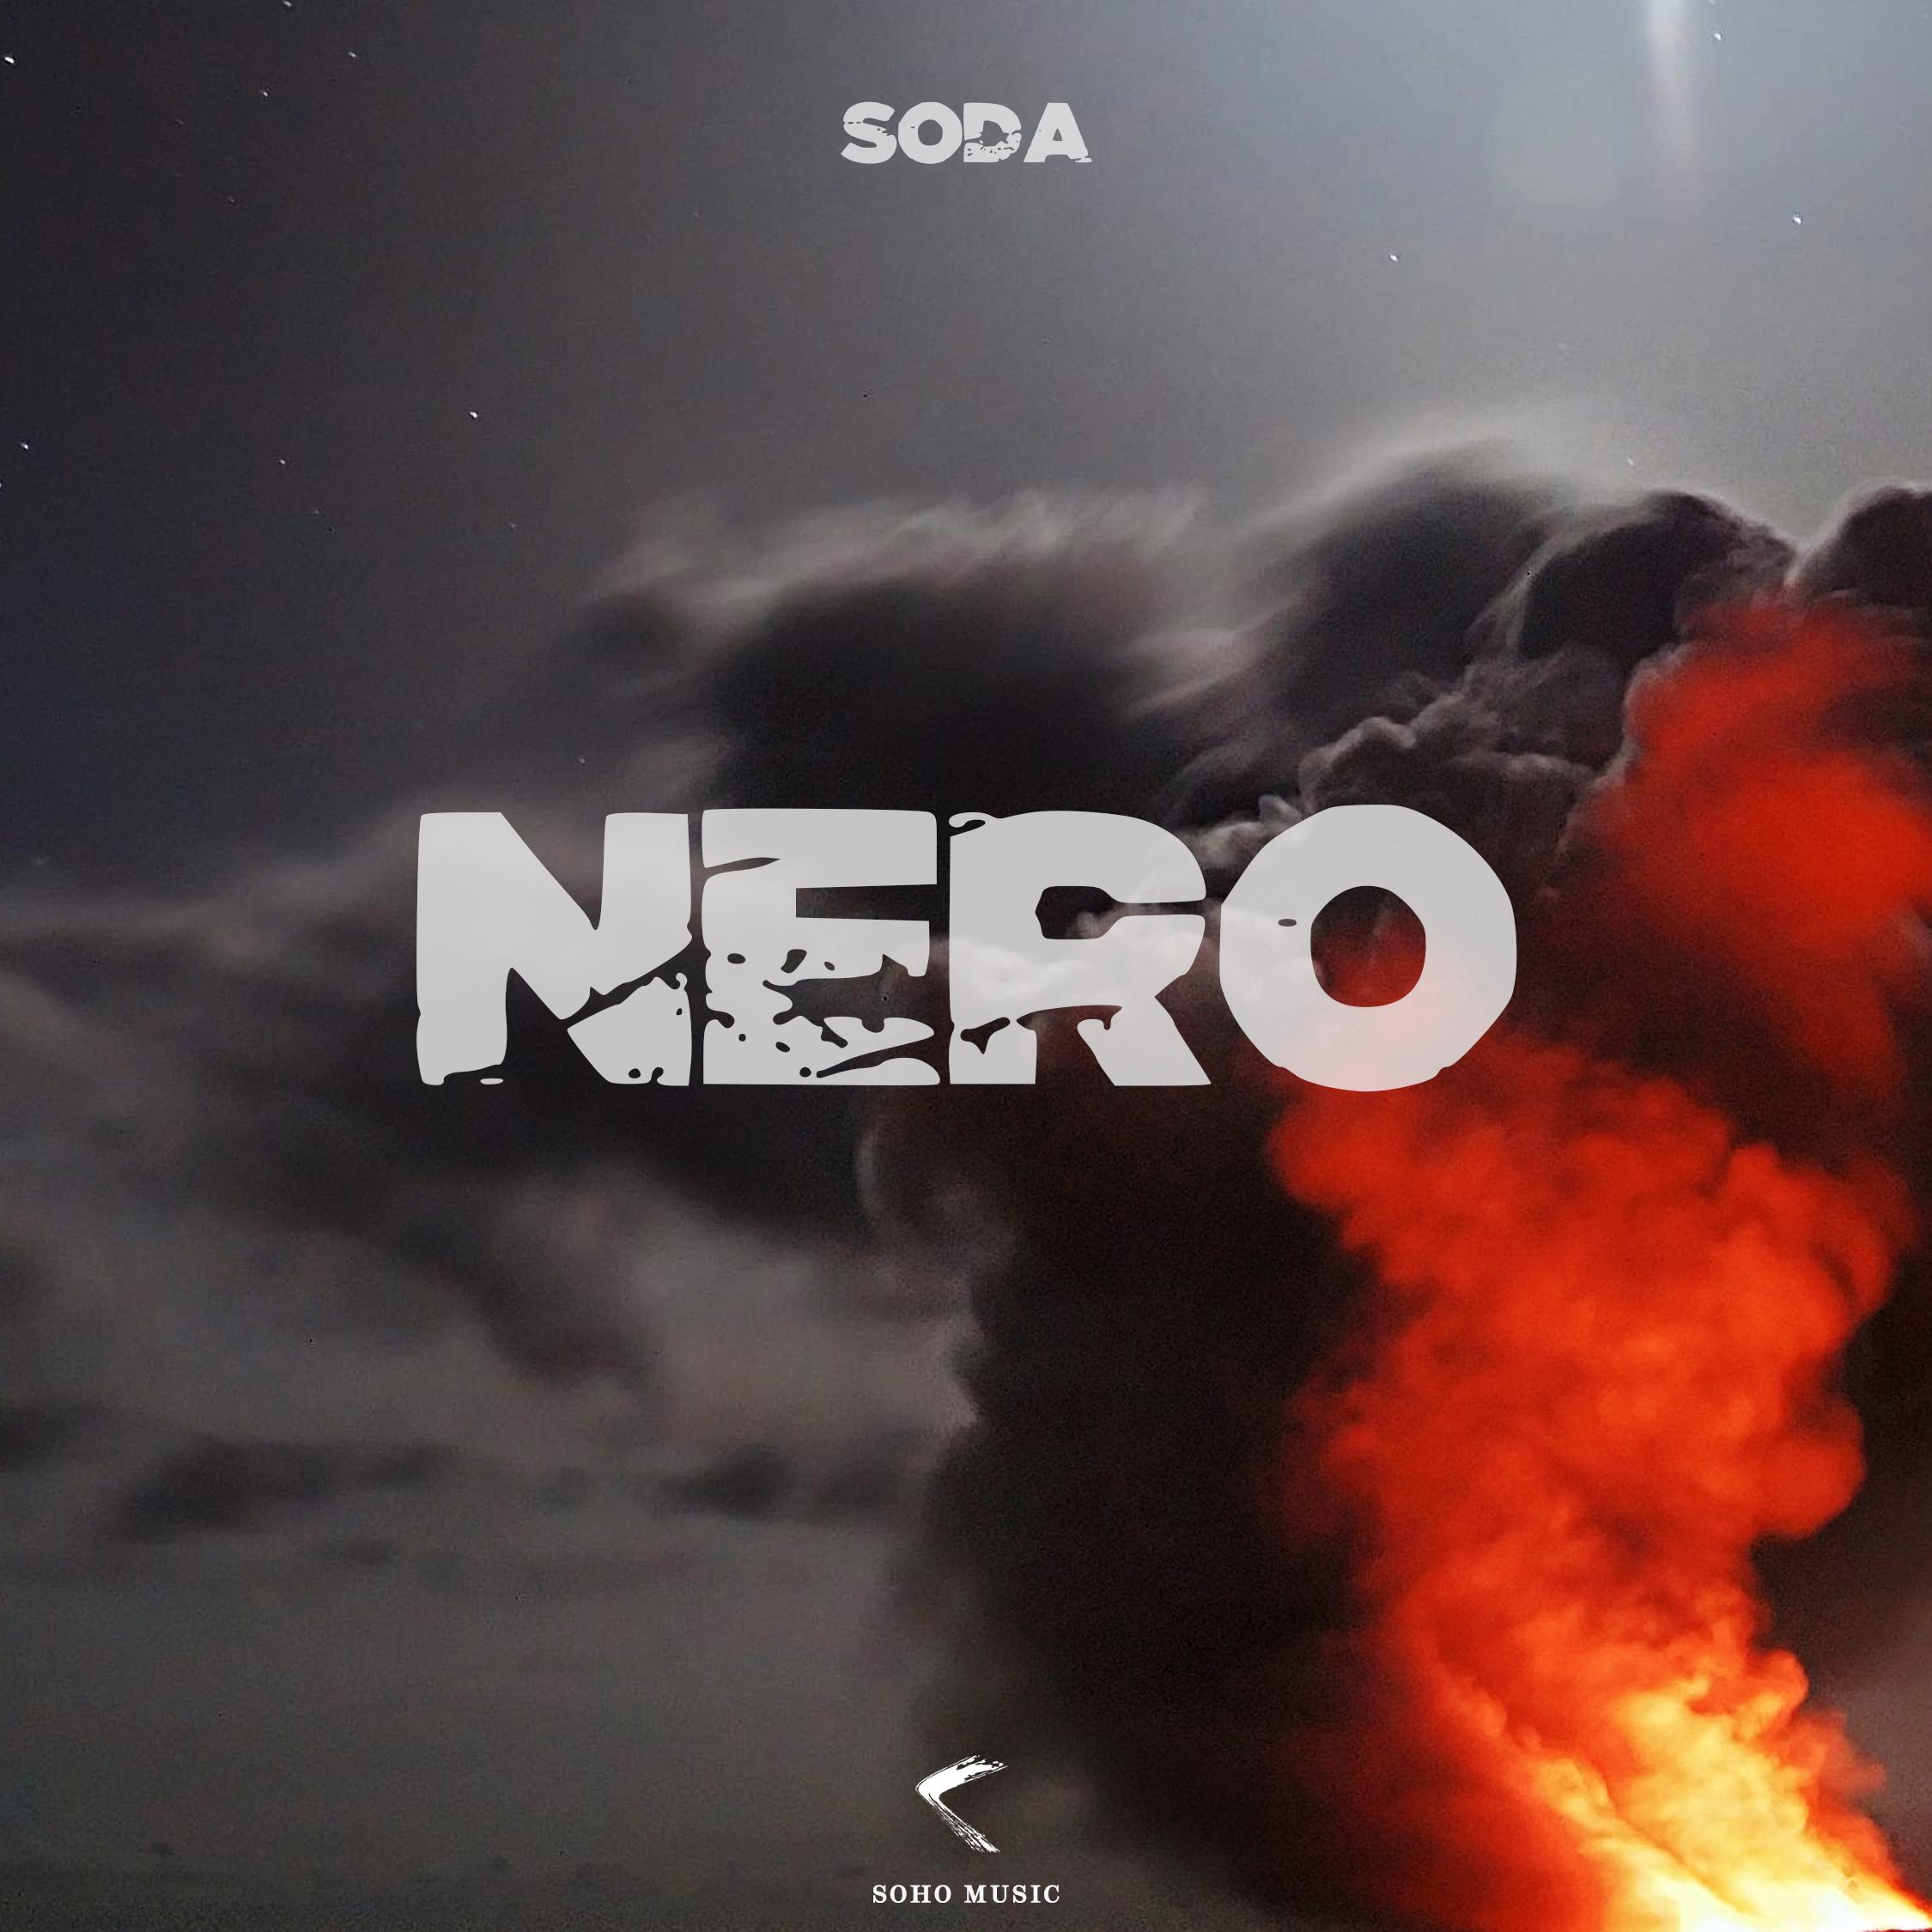 Soda - Nero